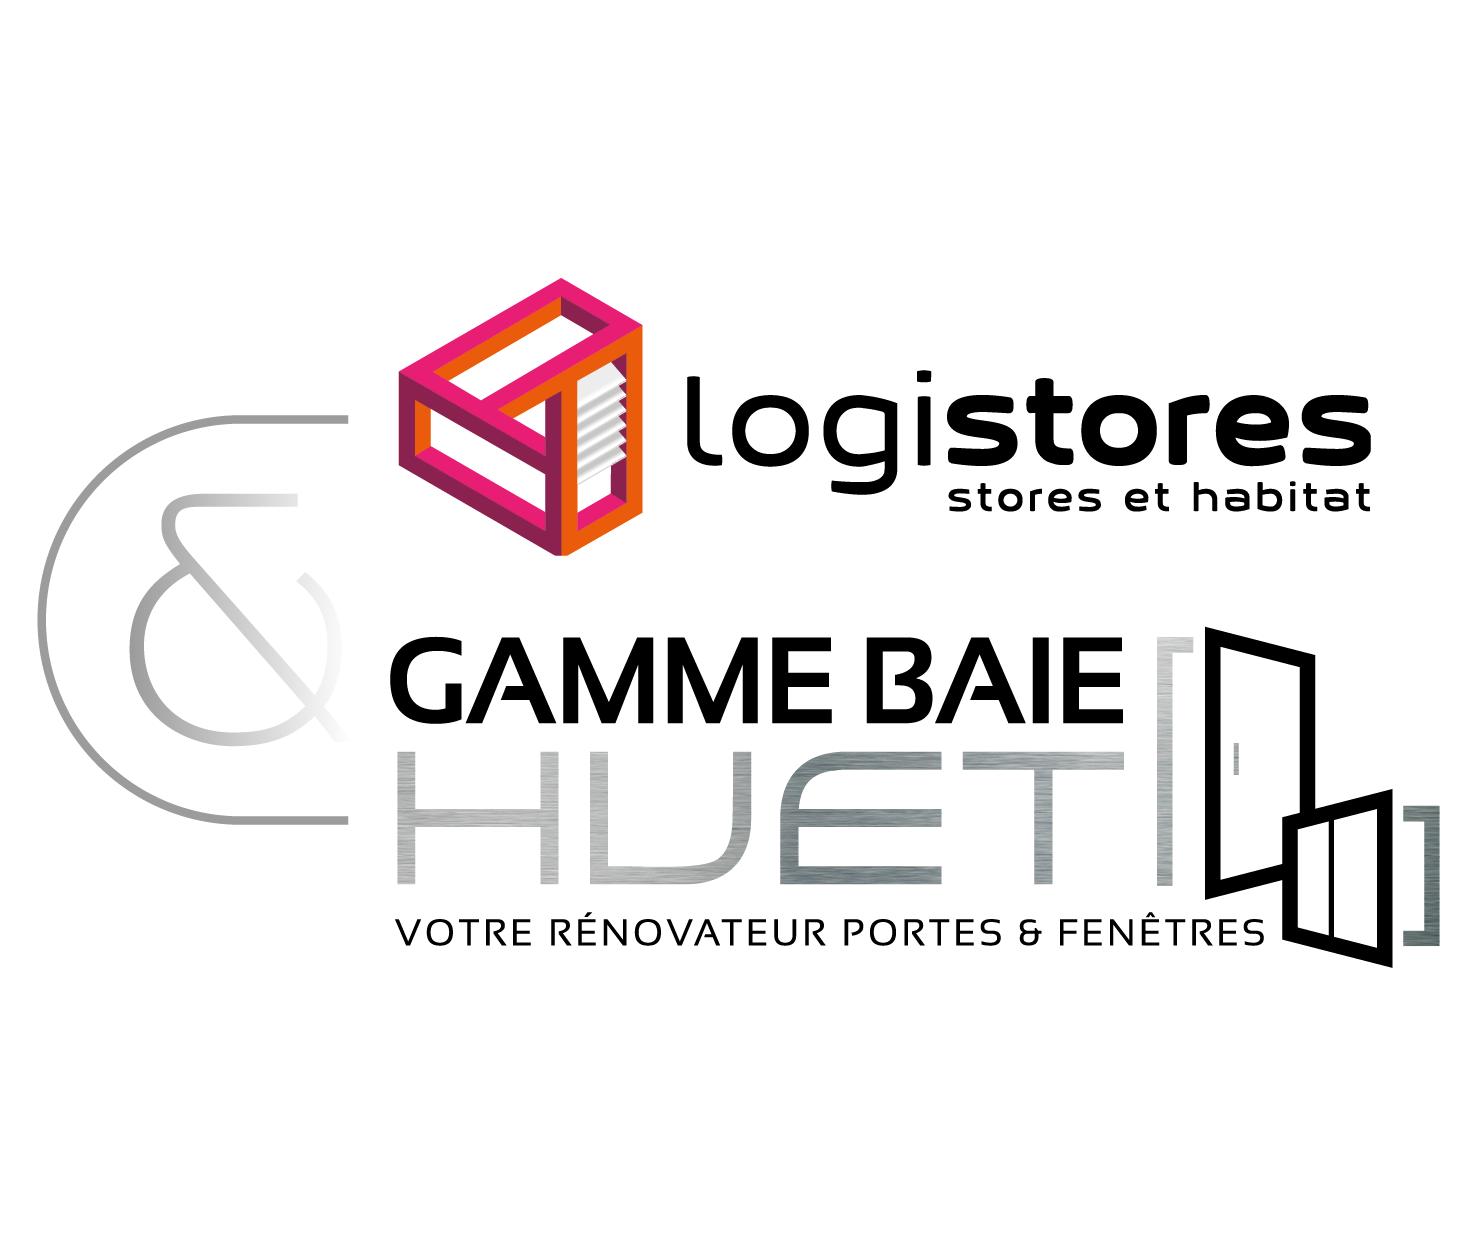 Logos Expert Logistores Gamme Baie-Huet